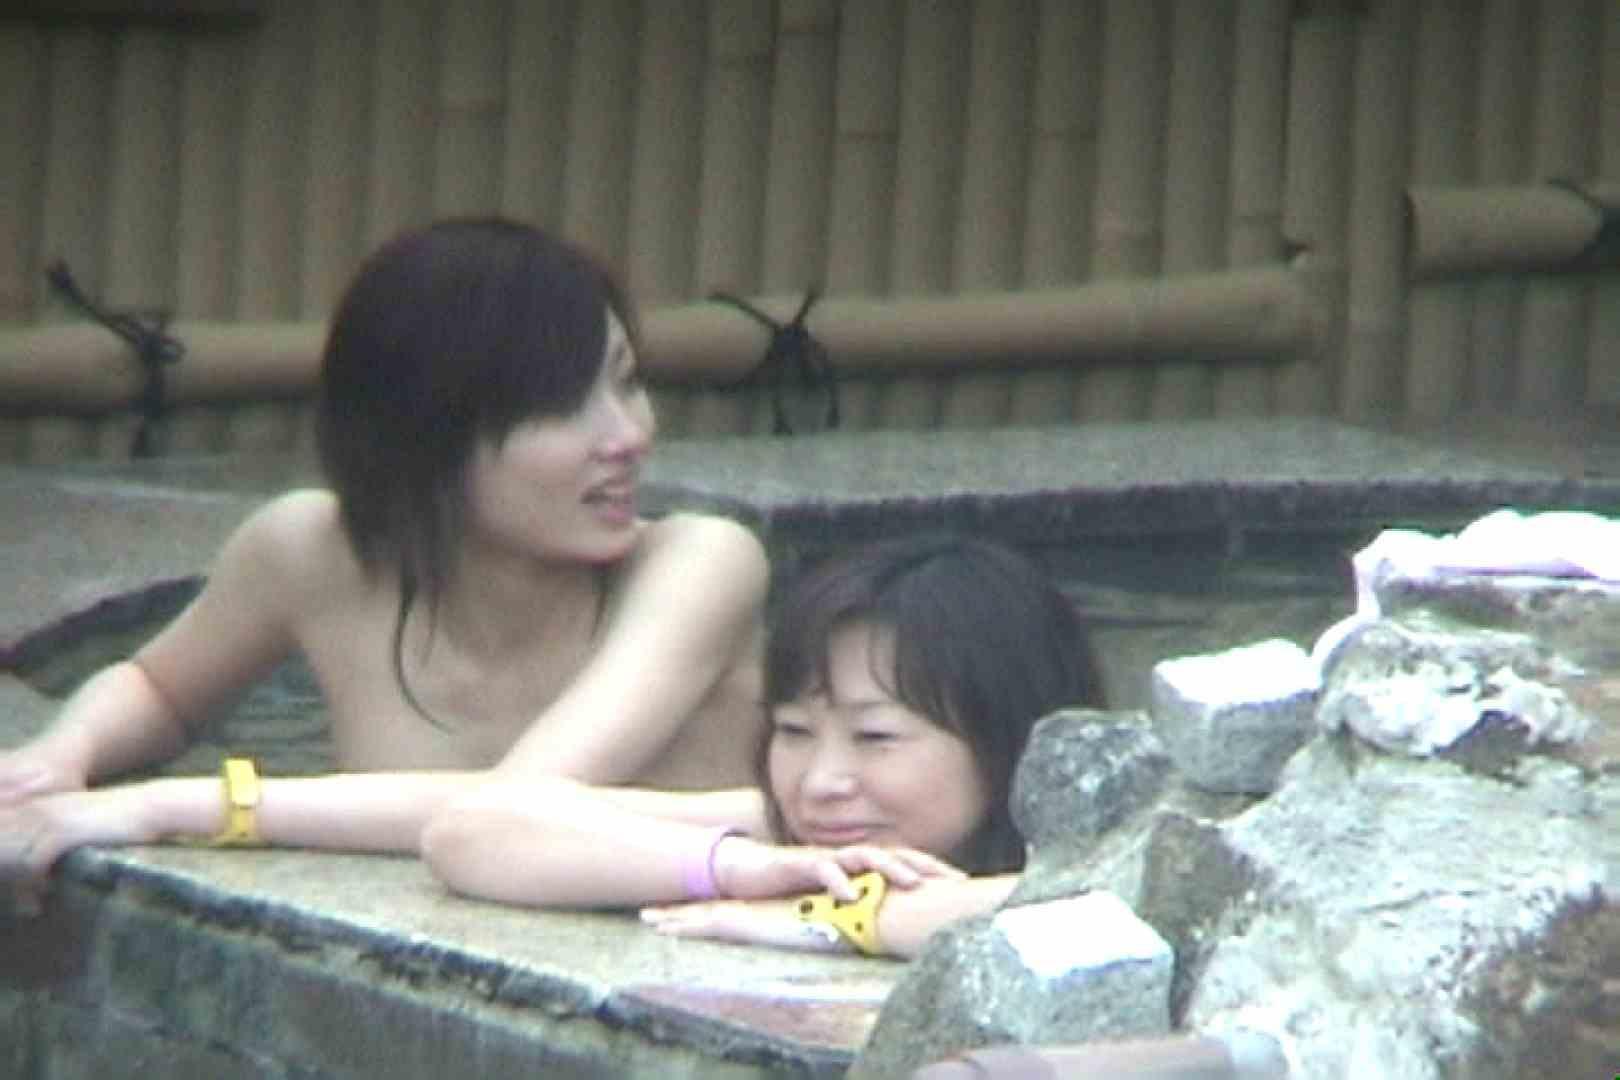 Aquaな露天風呂Vol.58【VIP限定】 露天風呂突入 盗撮動画紹介 97pic 56